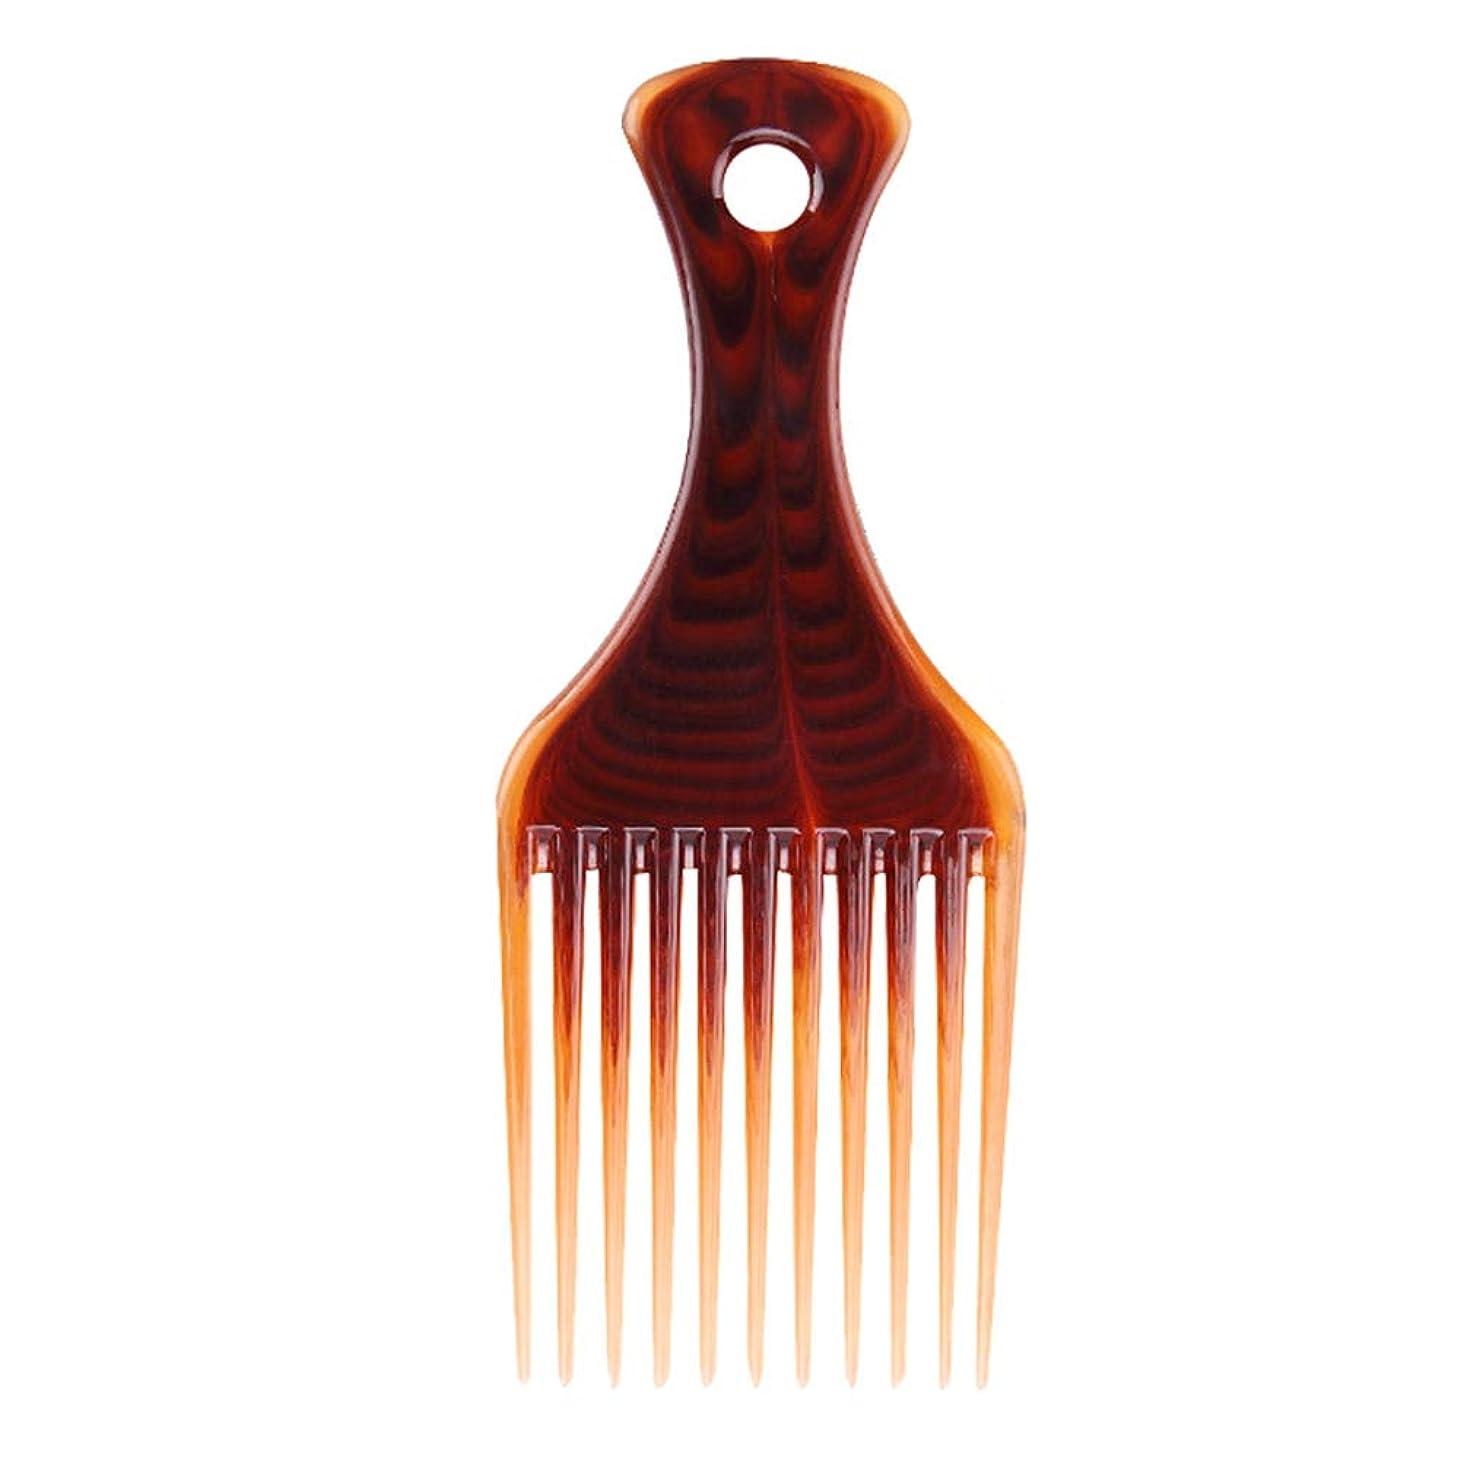 HEALIFTY プラスチックワイドトゥースコームサロン理容理髪ブラシヘアフォークコーム(コーヒー)